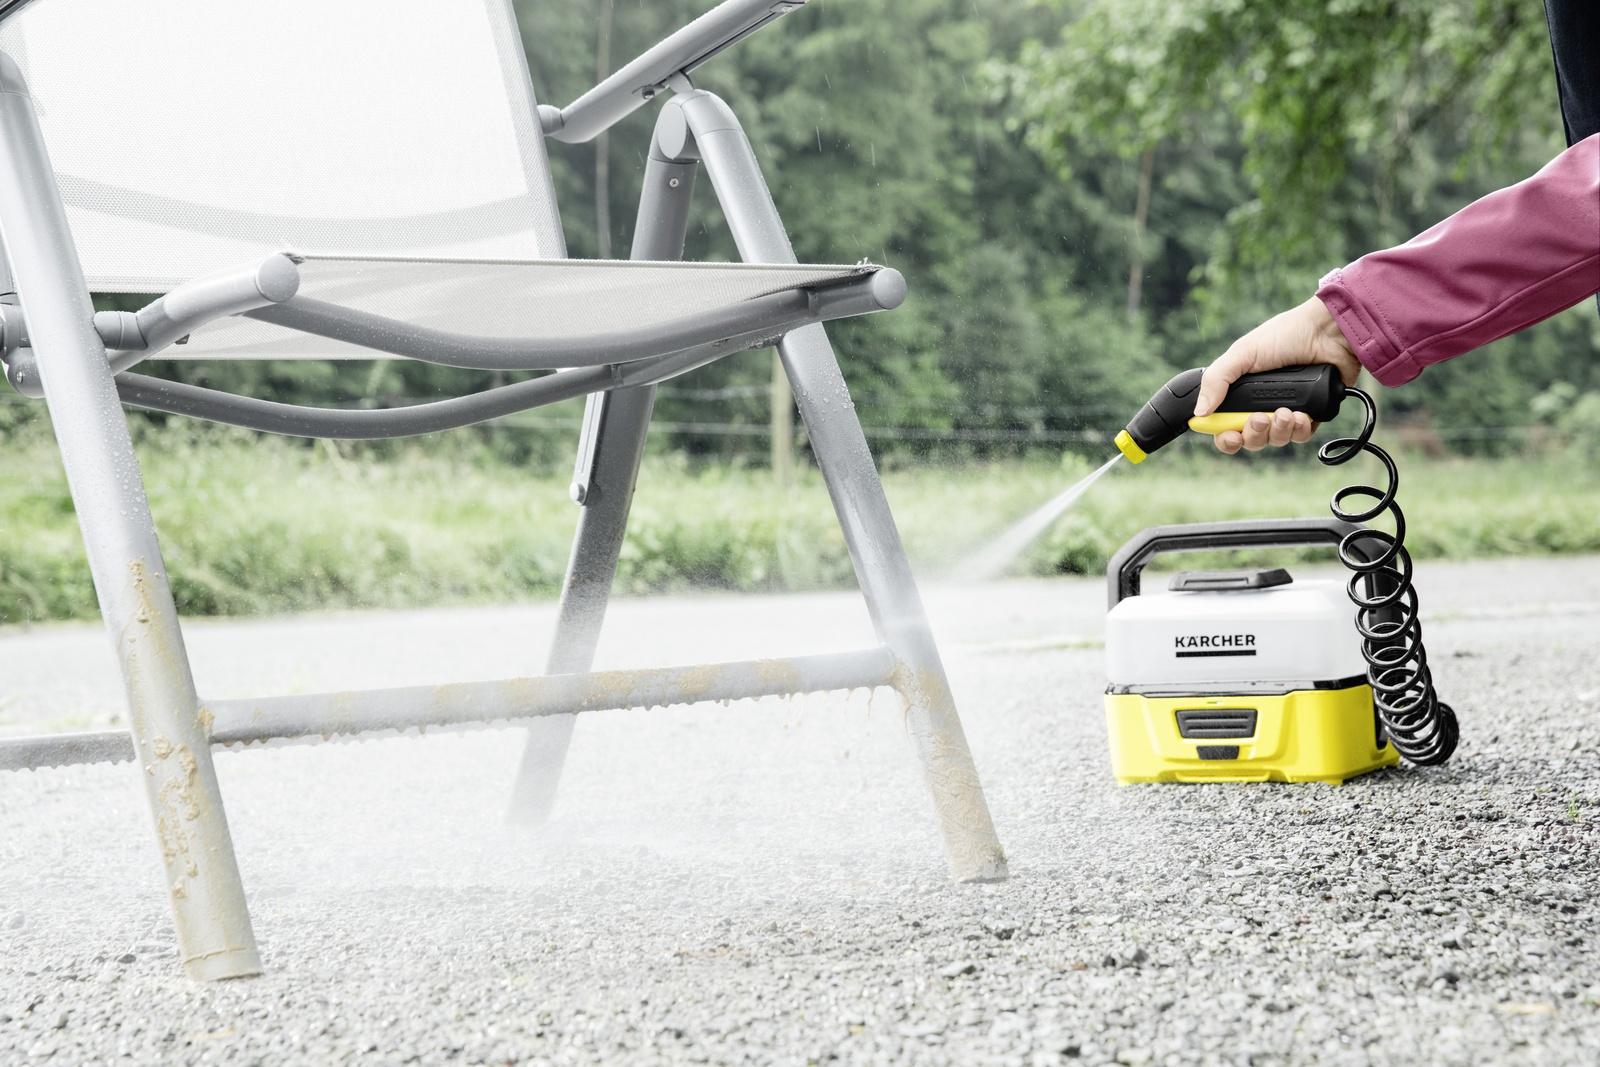 Mobile Outdoor Cleaner Oc 3 Karcher Australia